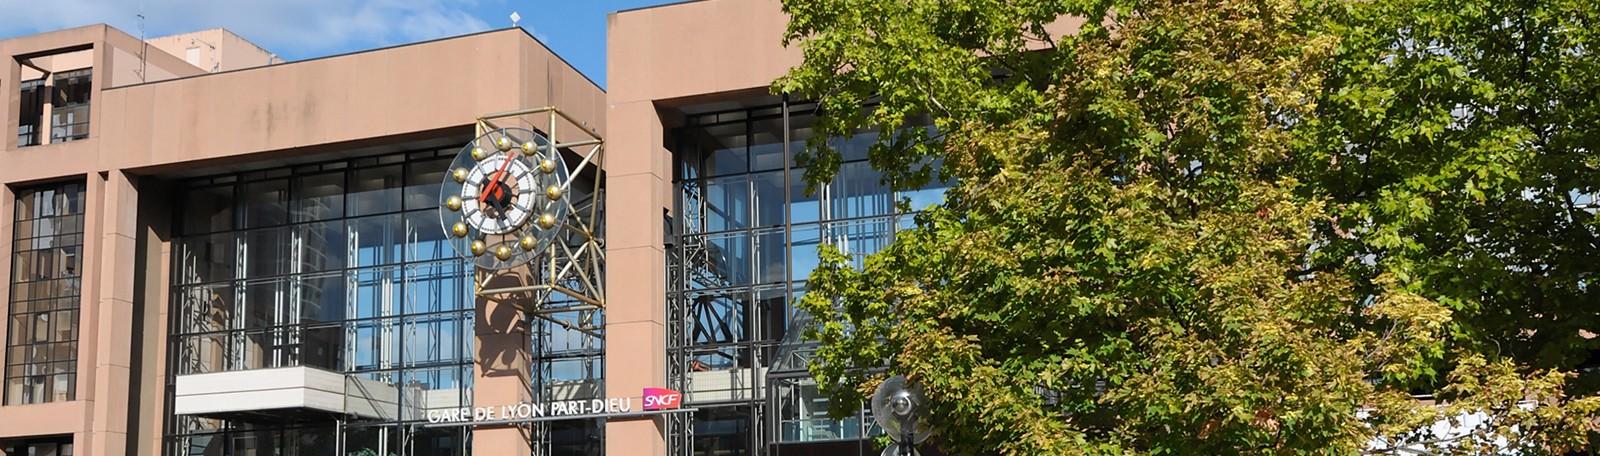 Parking Francfort - Gare Part-Dieu - 2 rue d'Aubigny 69003 Lyon